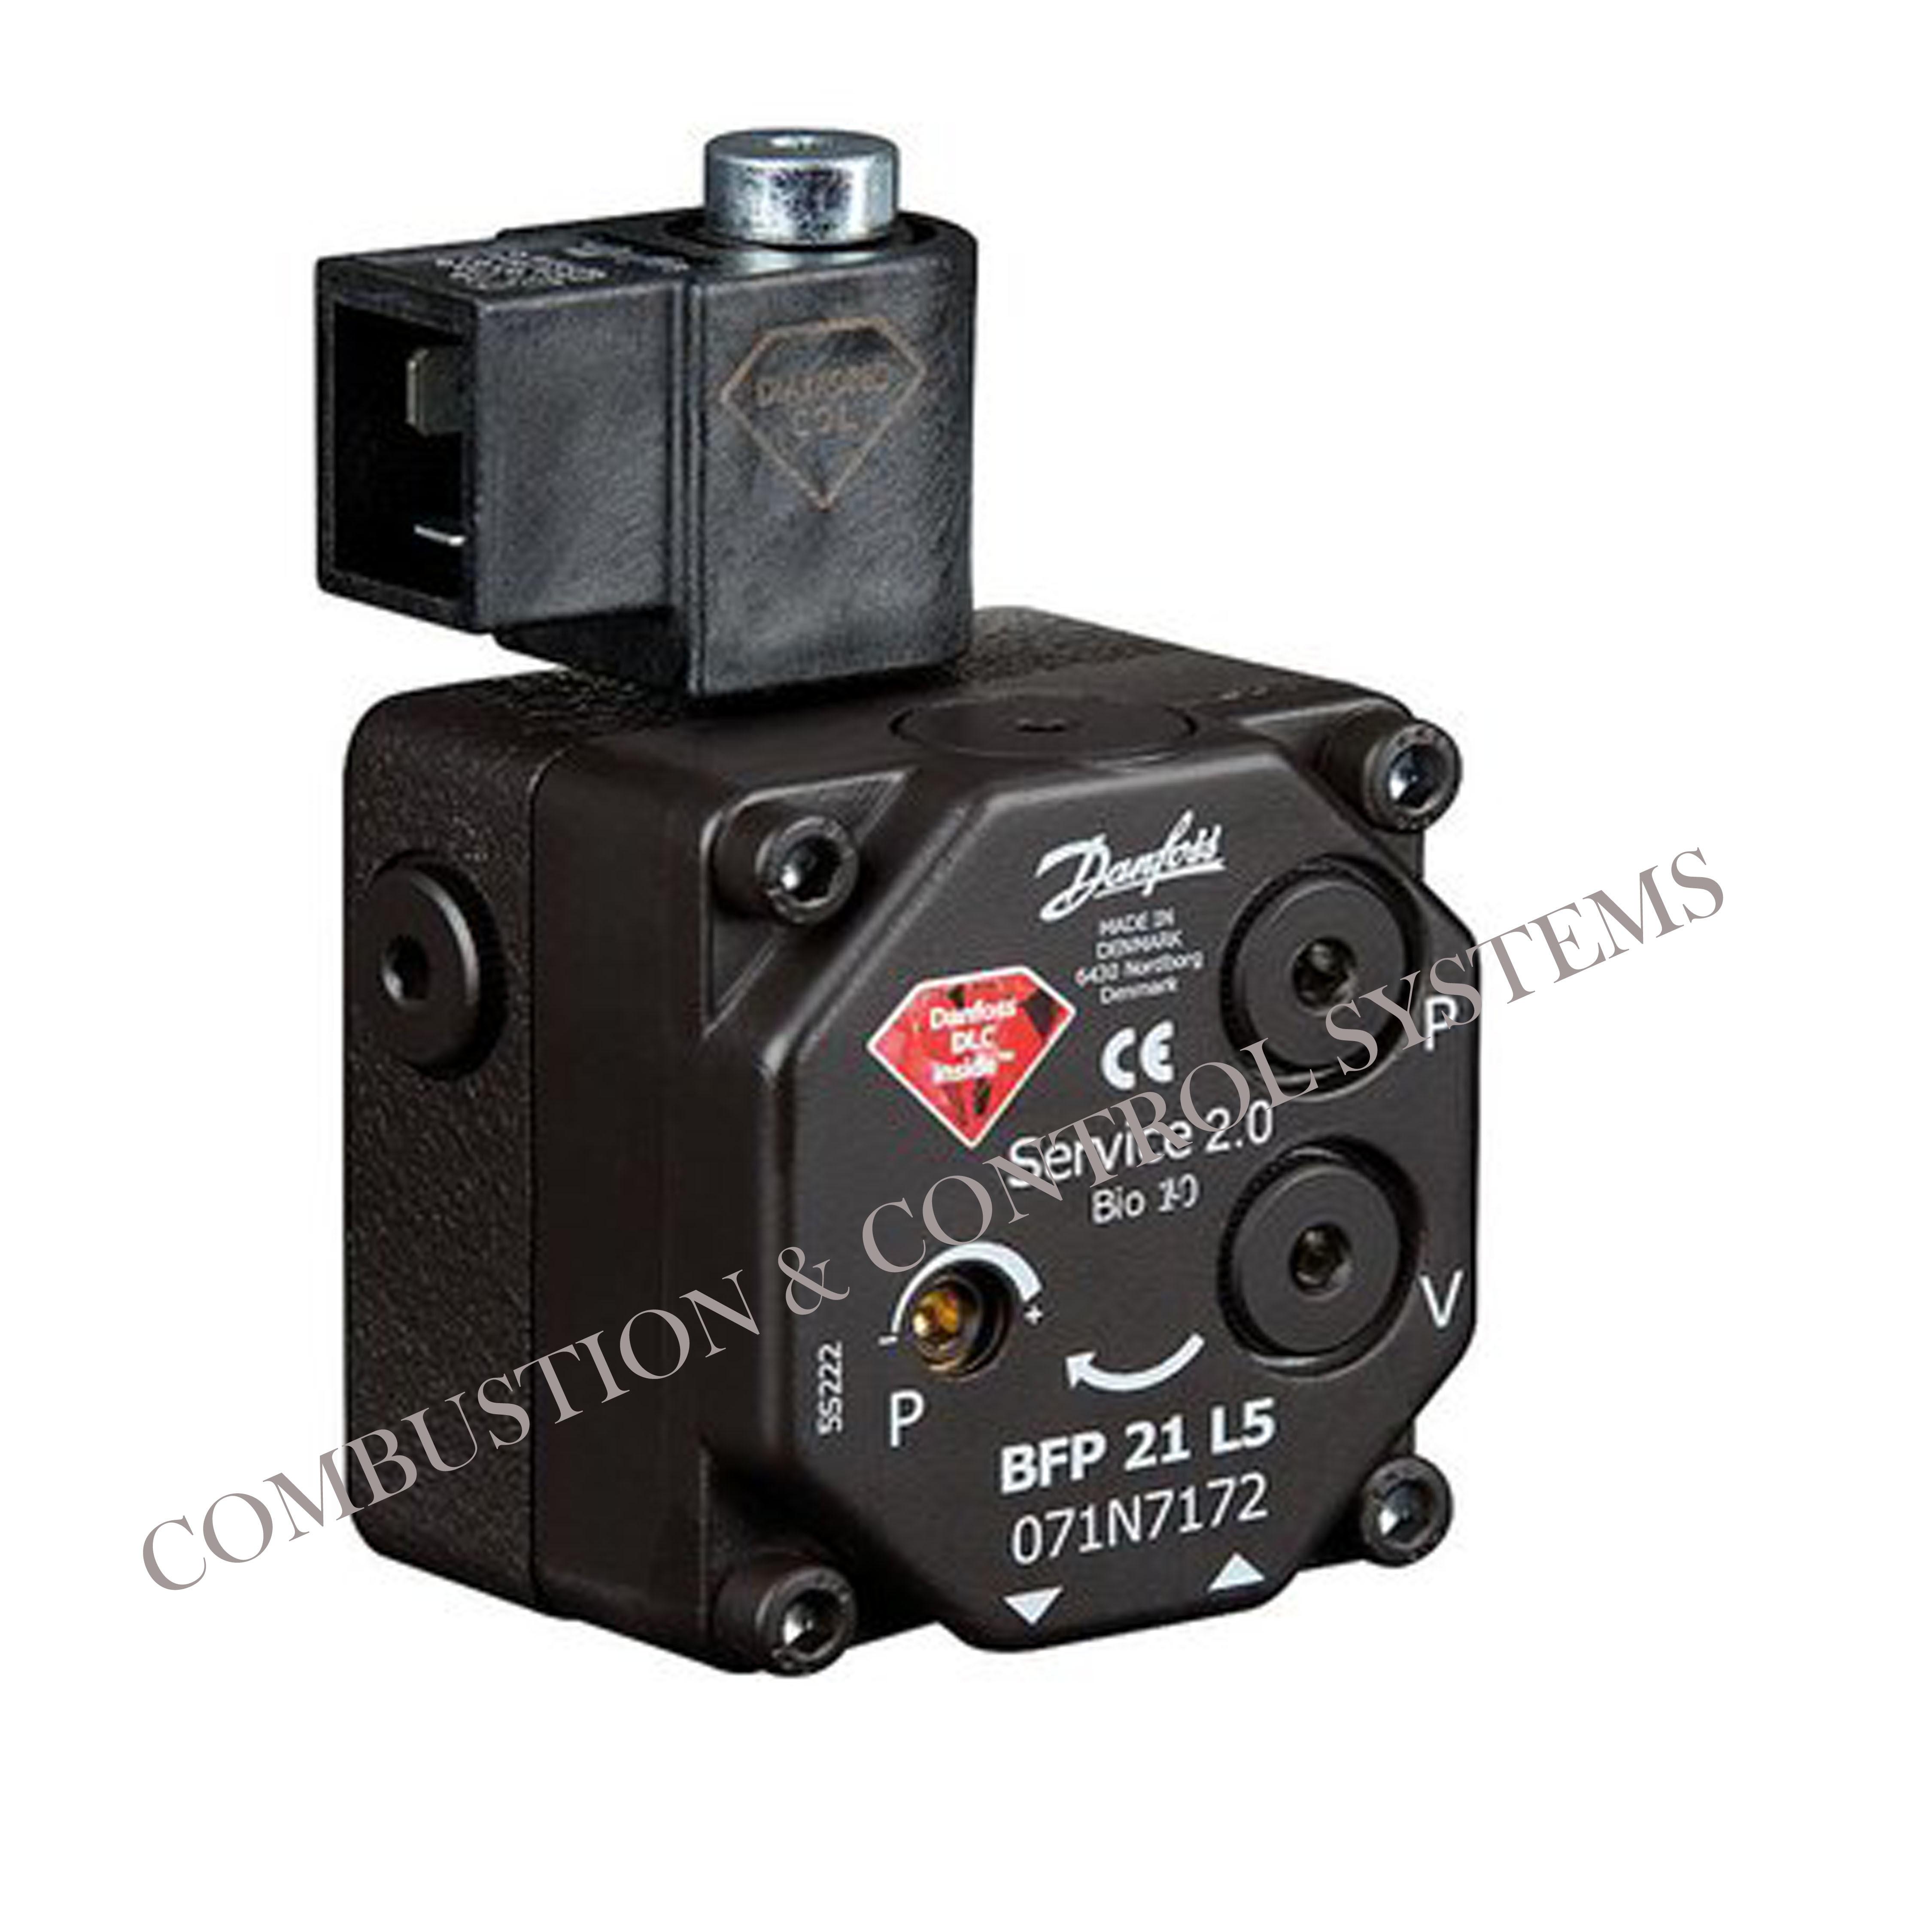 Danfoss BFP 21 L5 Oil Burner Pump